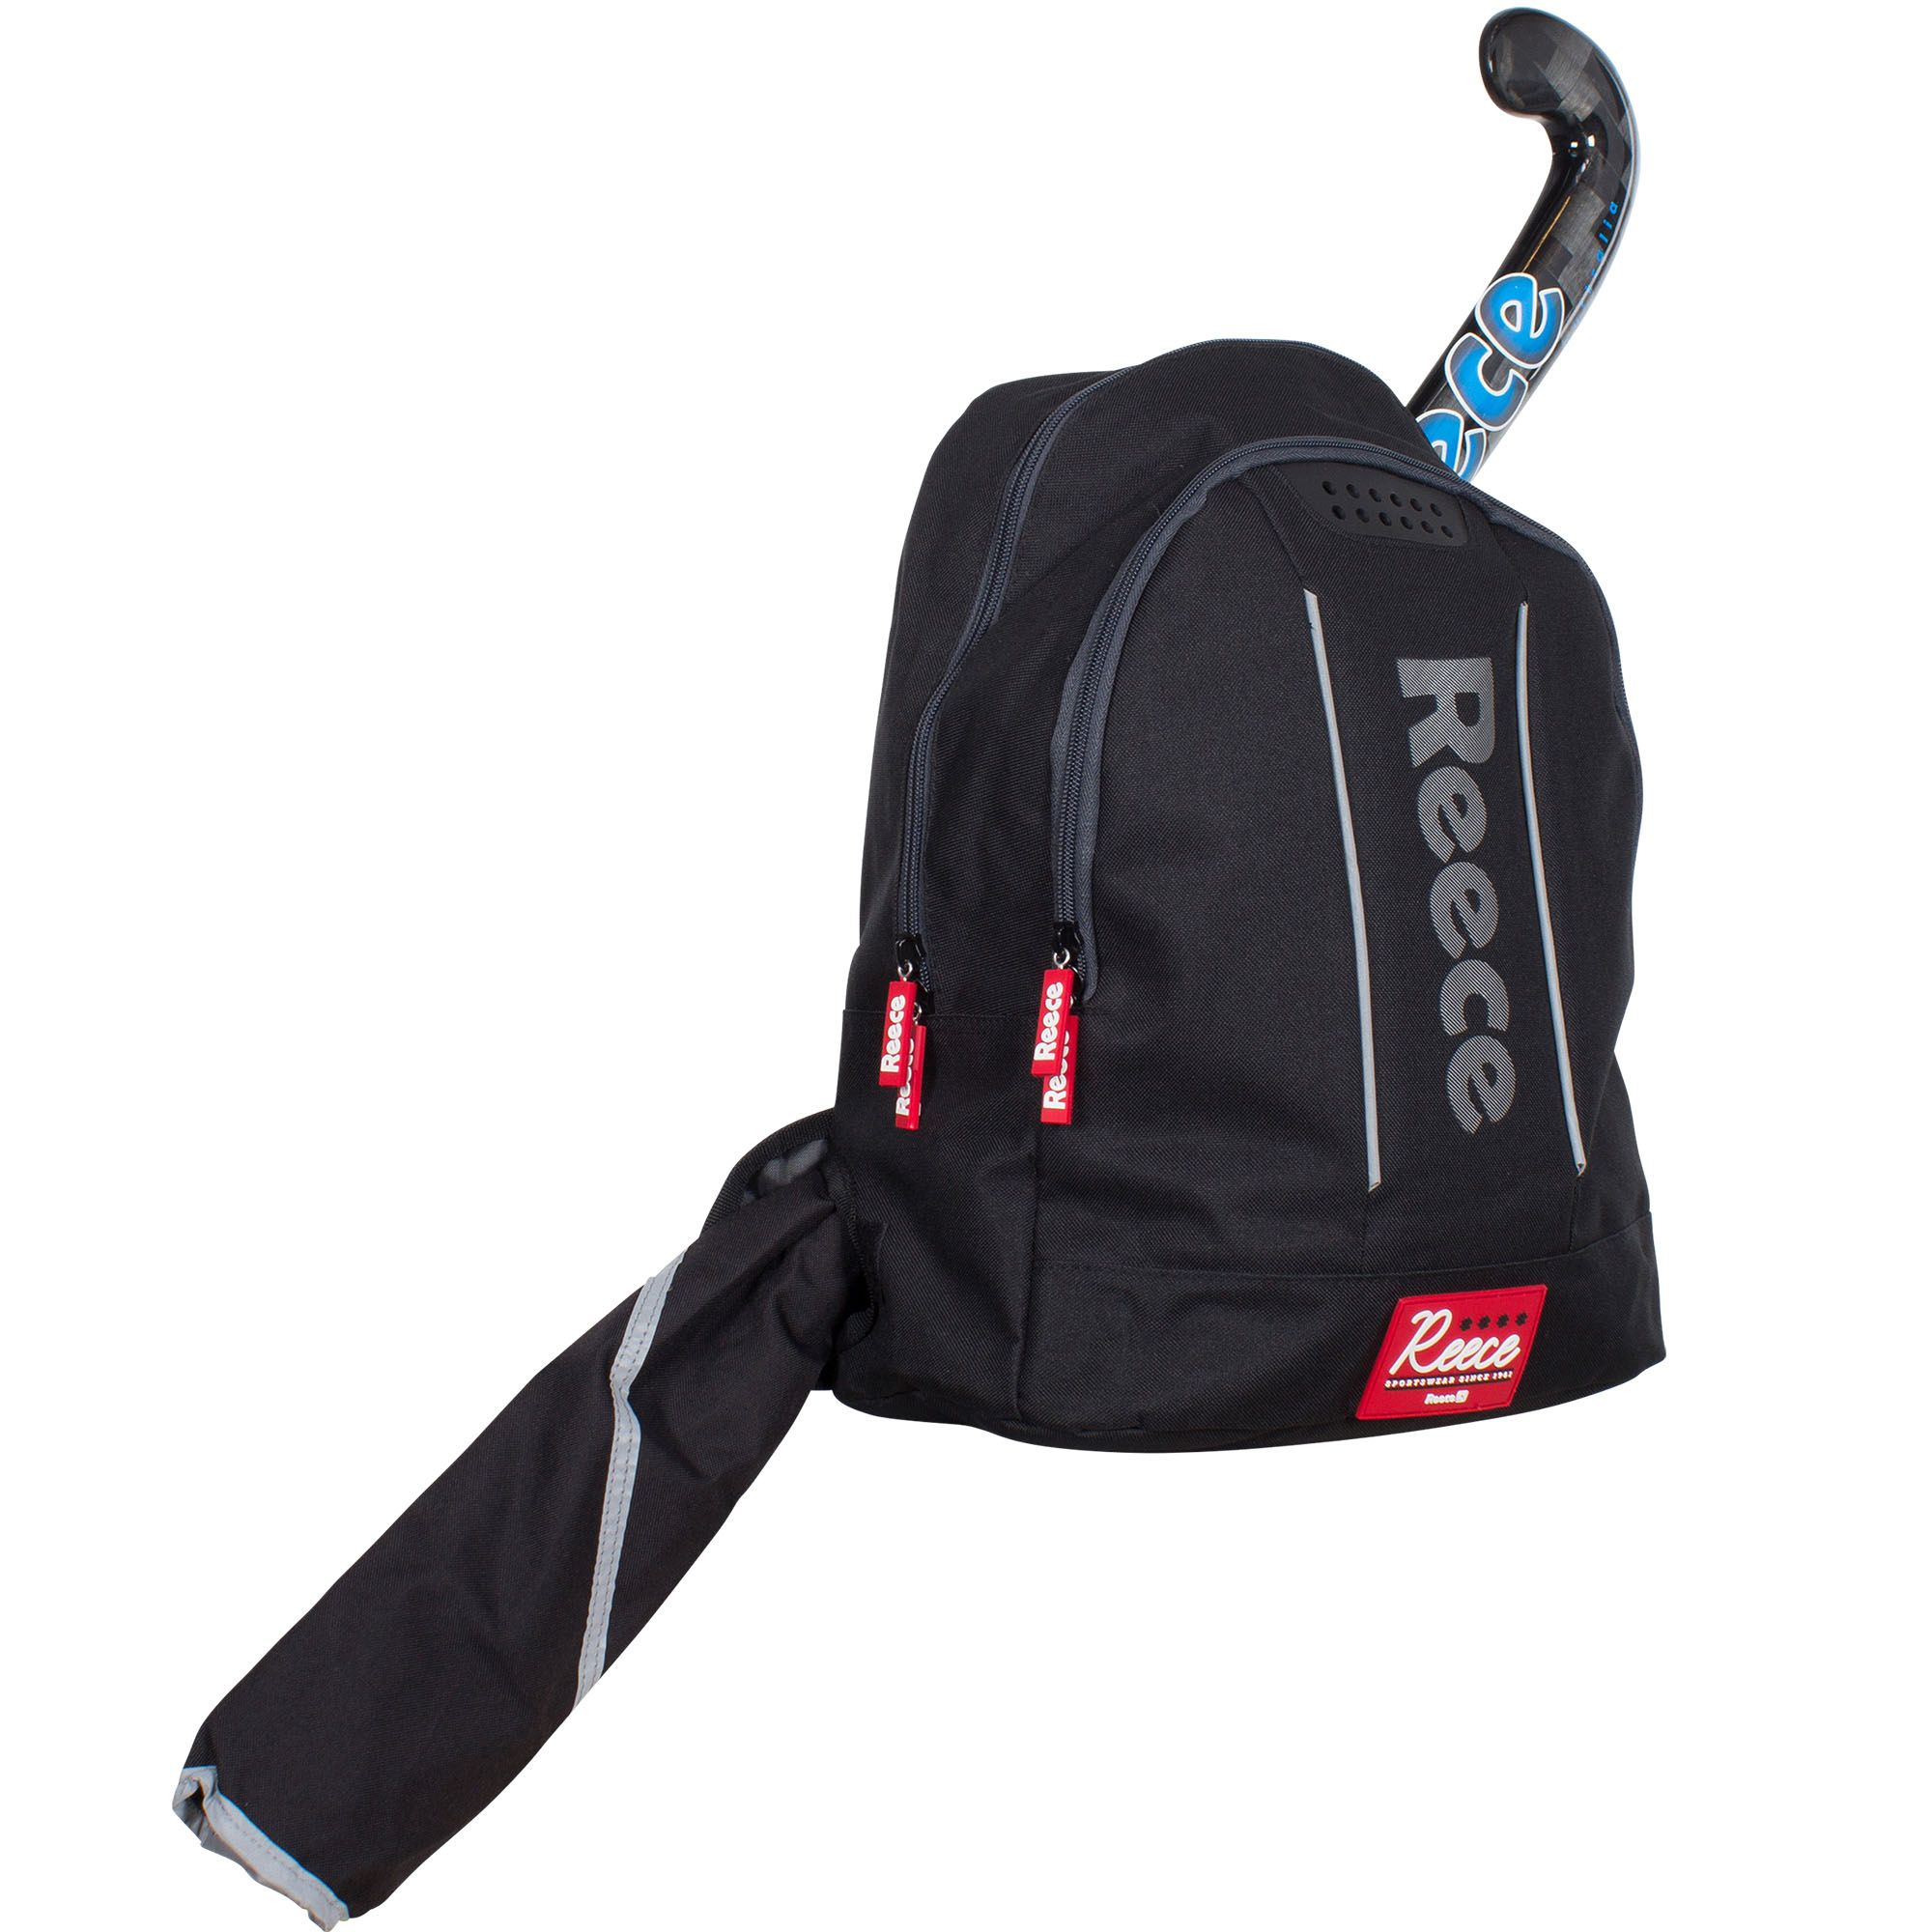 5c579cdc6fa Evans Hockey Backpack-885803-8000-NO SZ-Black-Reeceaustralia.com